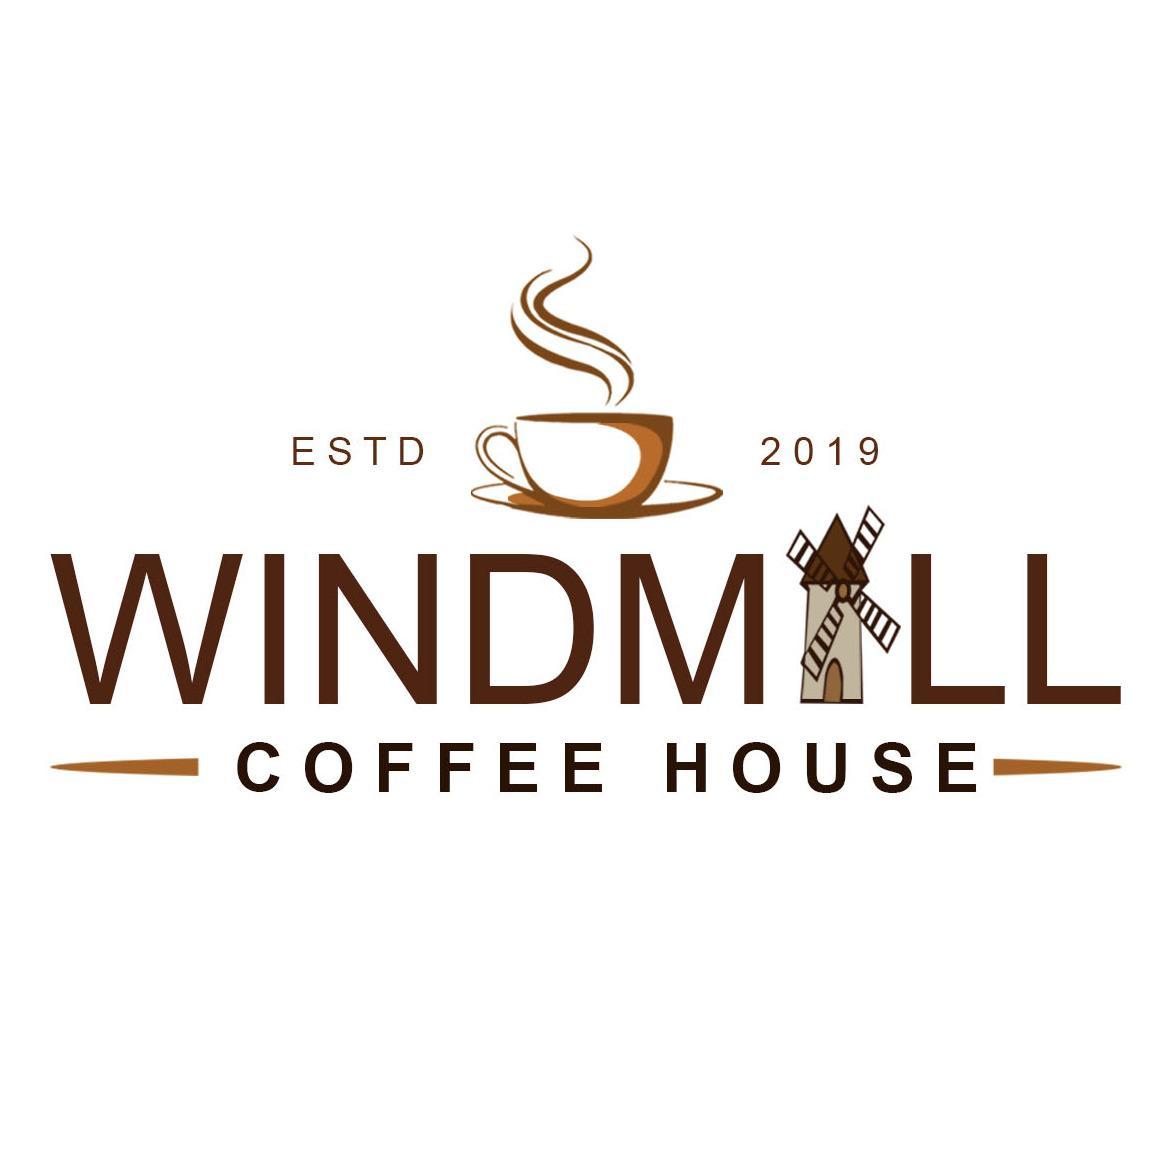 Windmill Coffee House